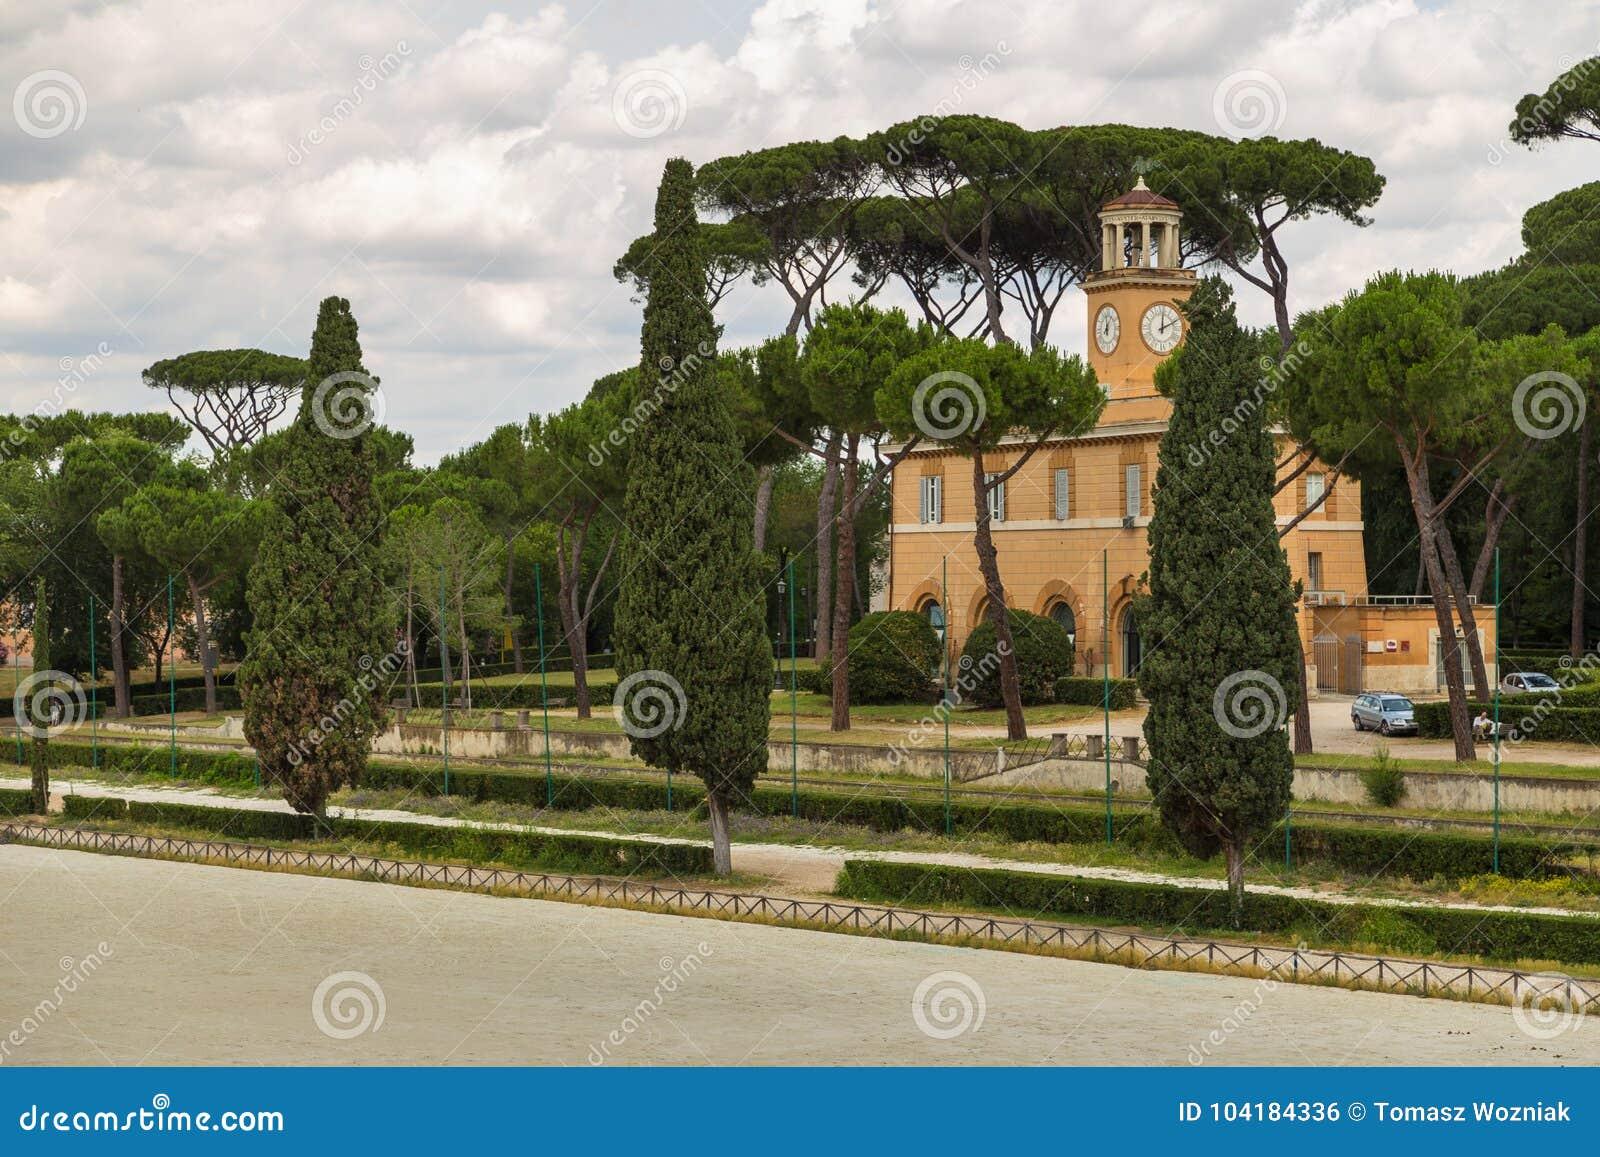 Siena Square Inside The Villa Borghese Gardens. Stock Photo - Image ...